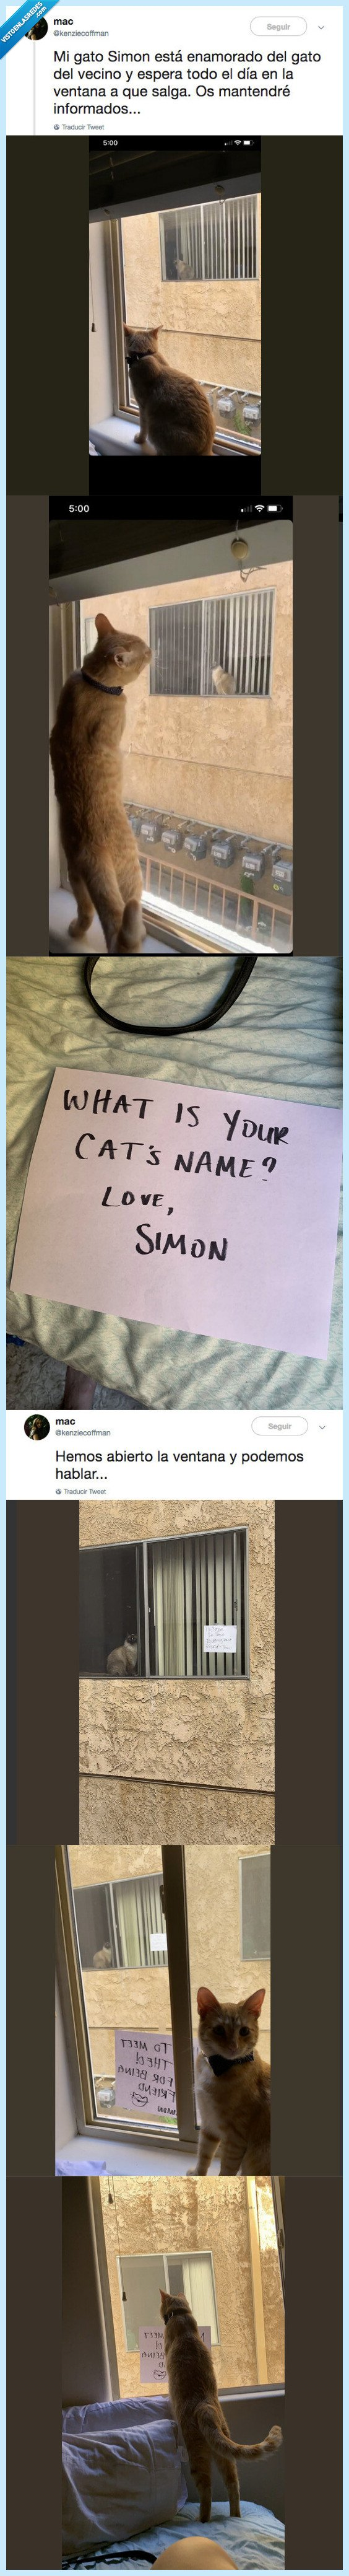 amor,gato,internet